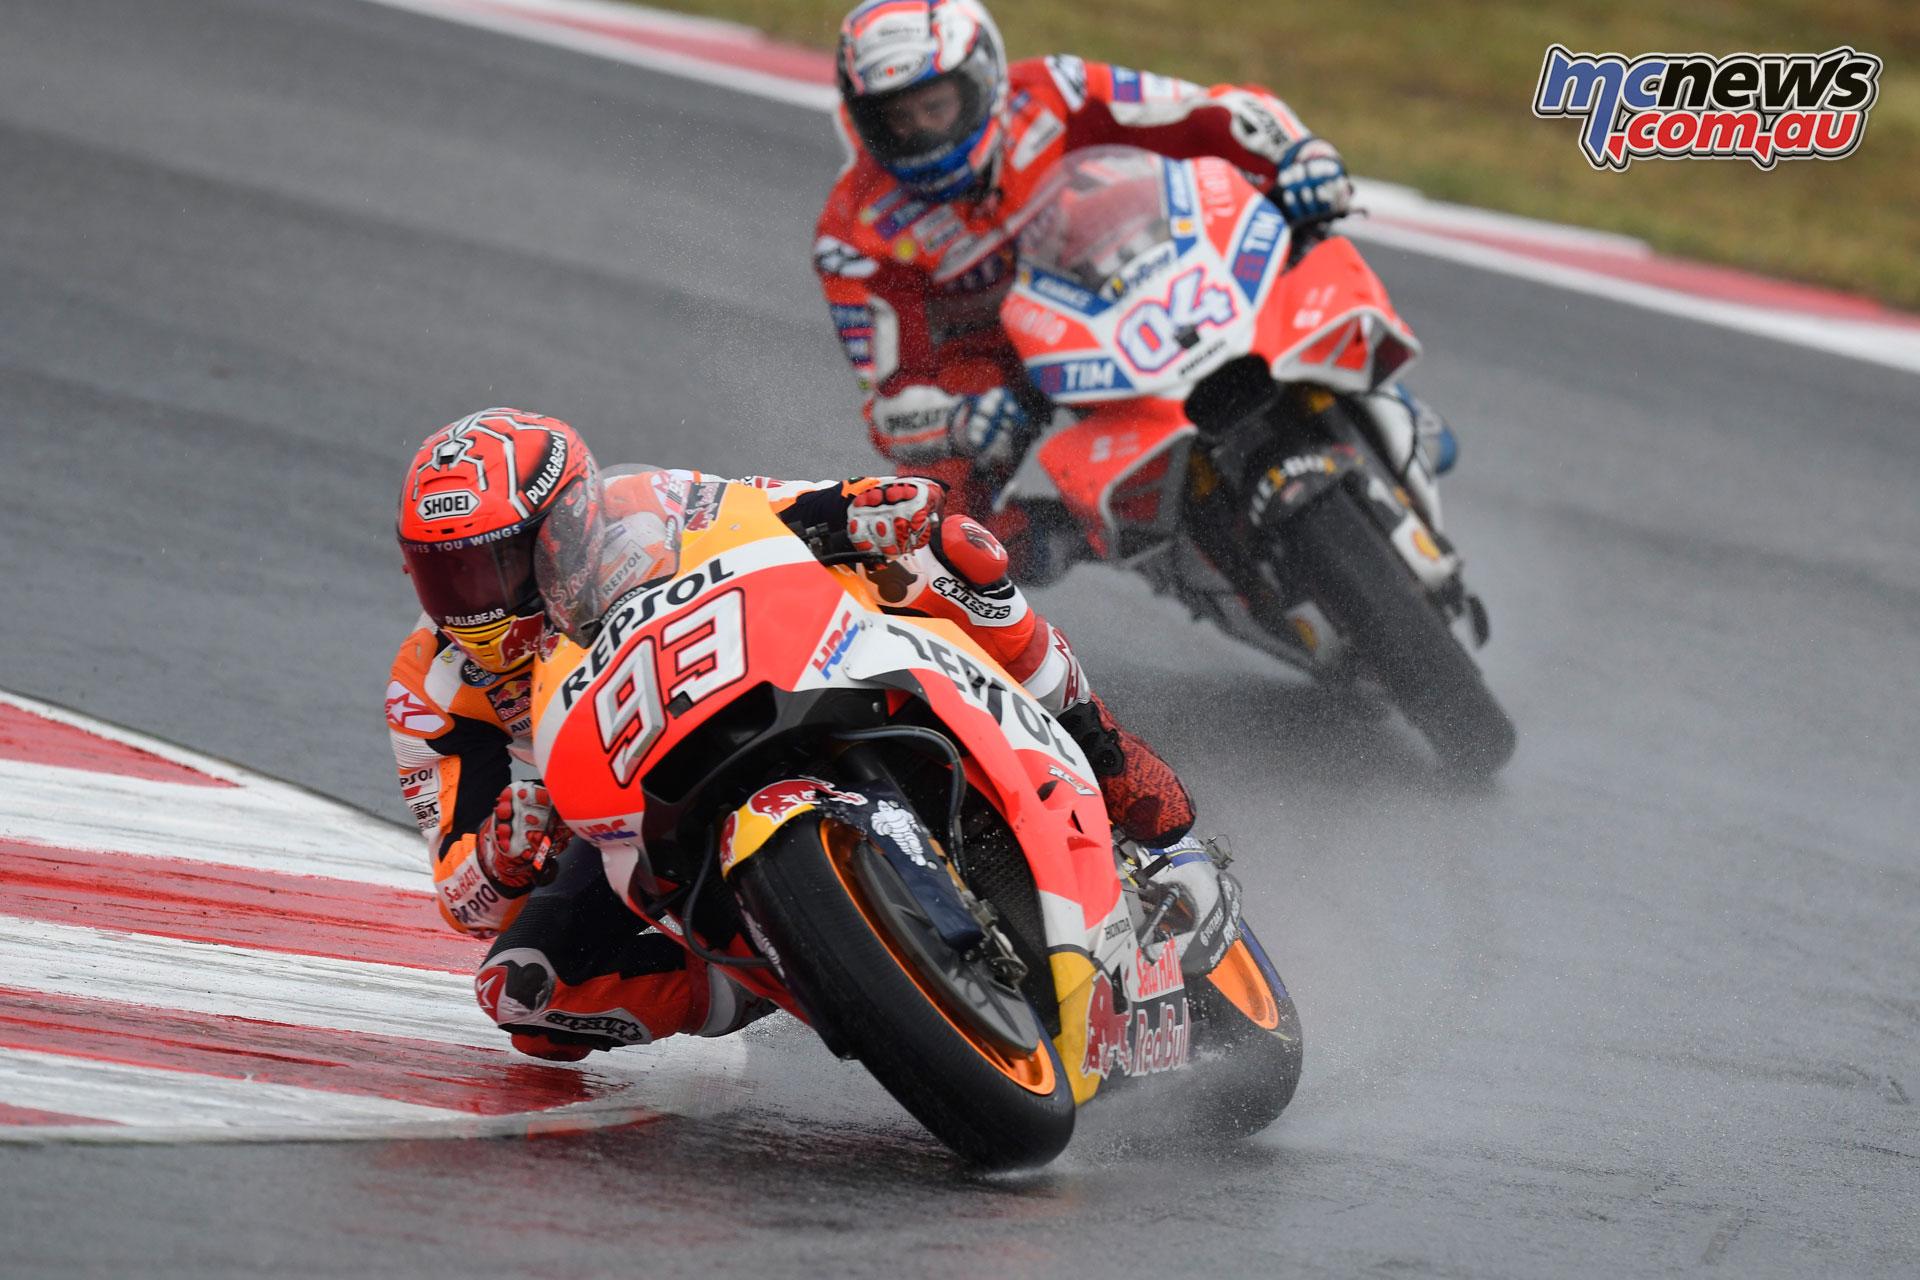 Marquez wins Misano | Petrucci, Dovizioso on podium | MCNews.com.au